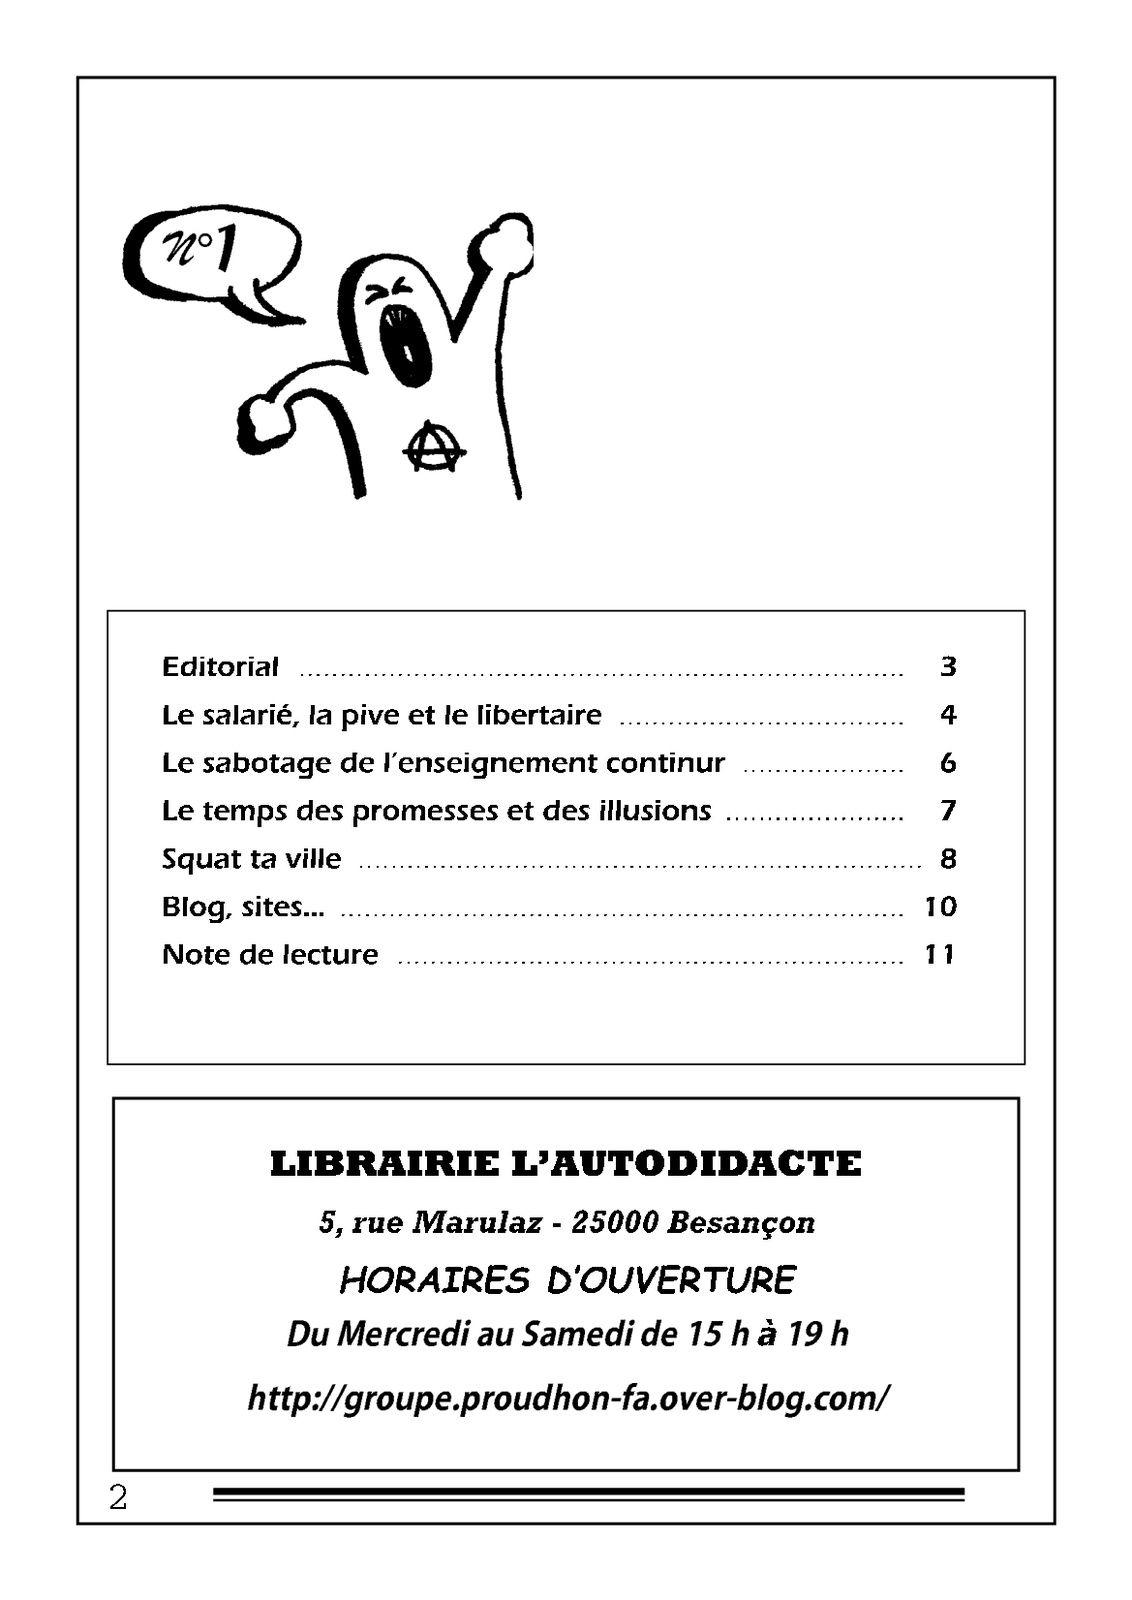 Drapeau noir n° 1